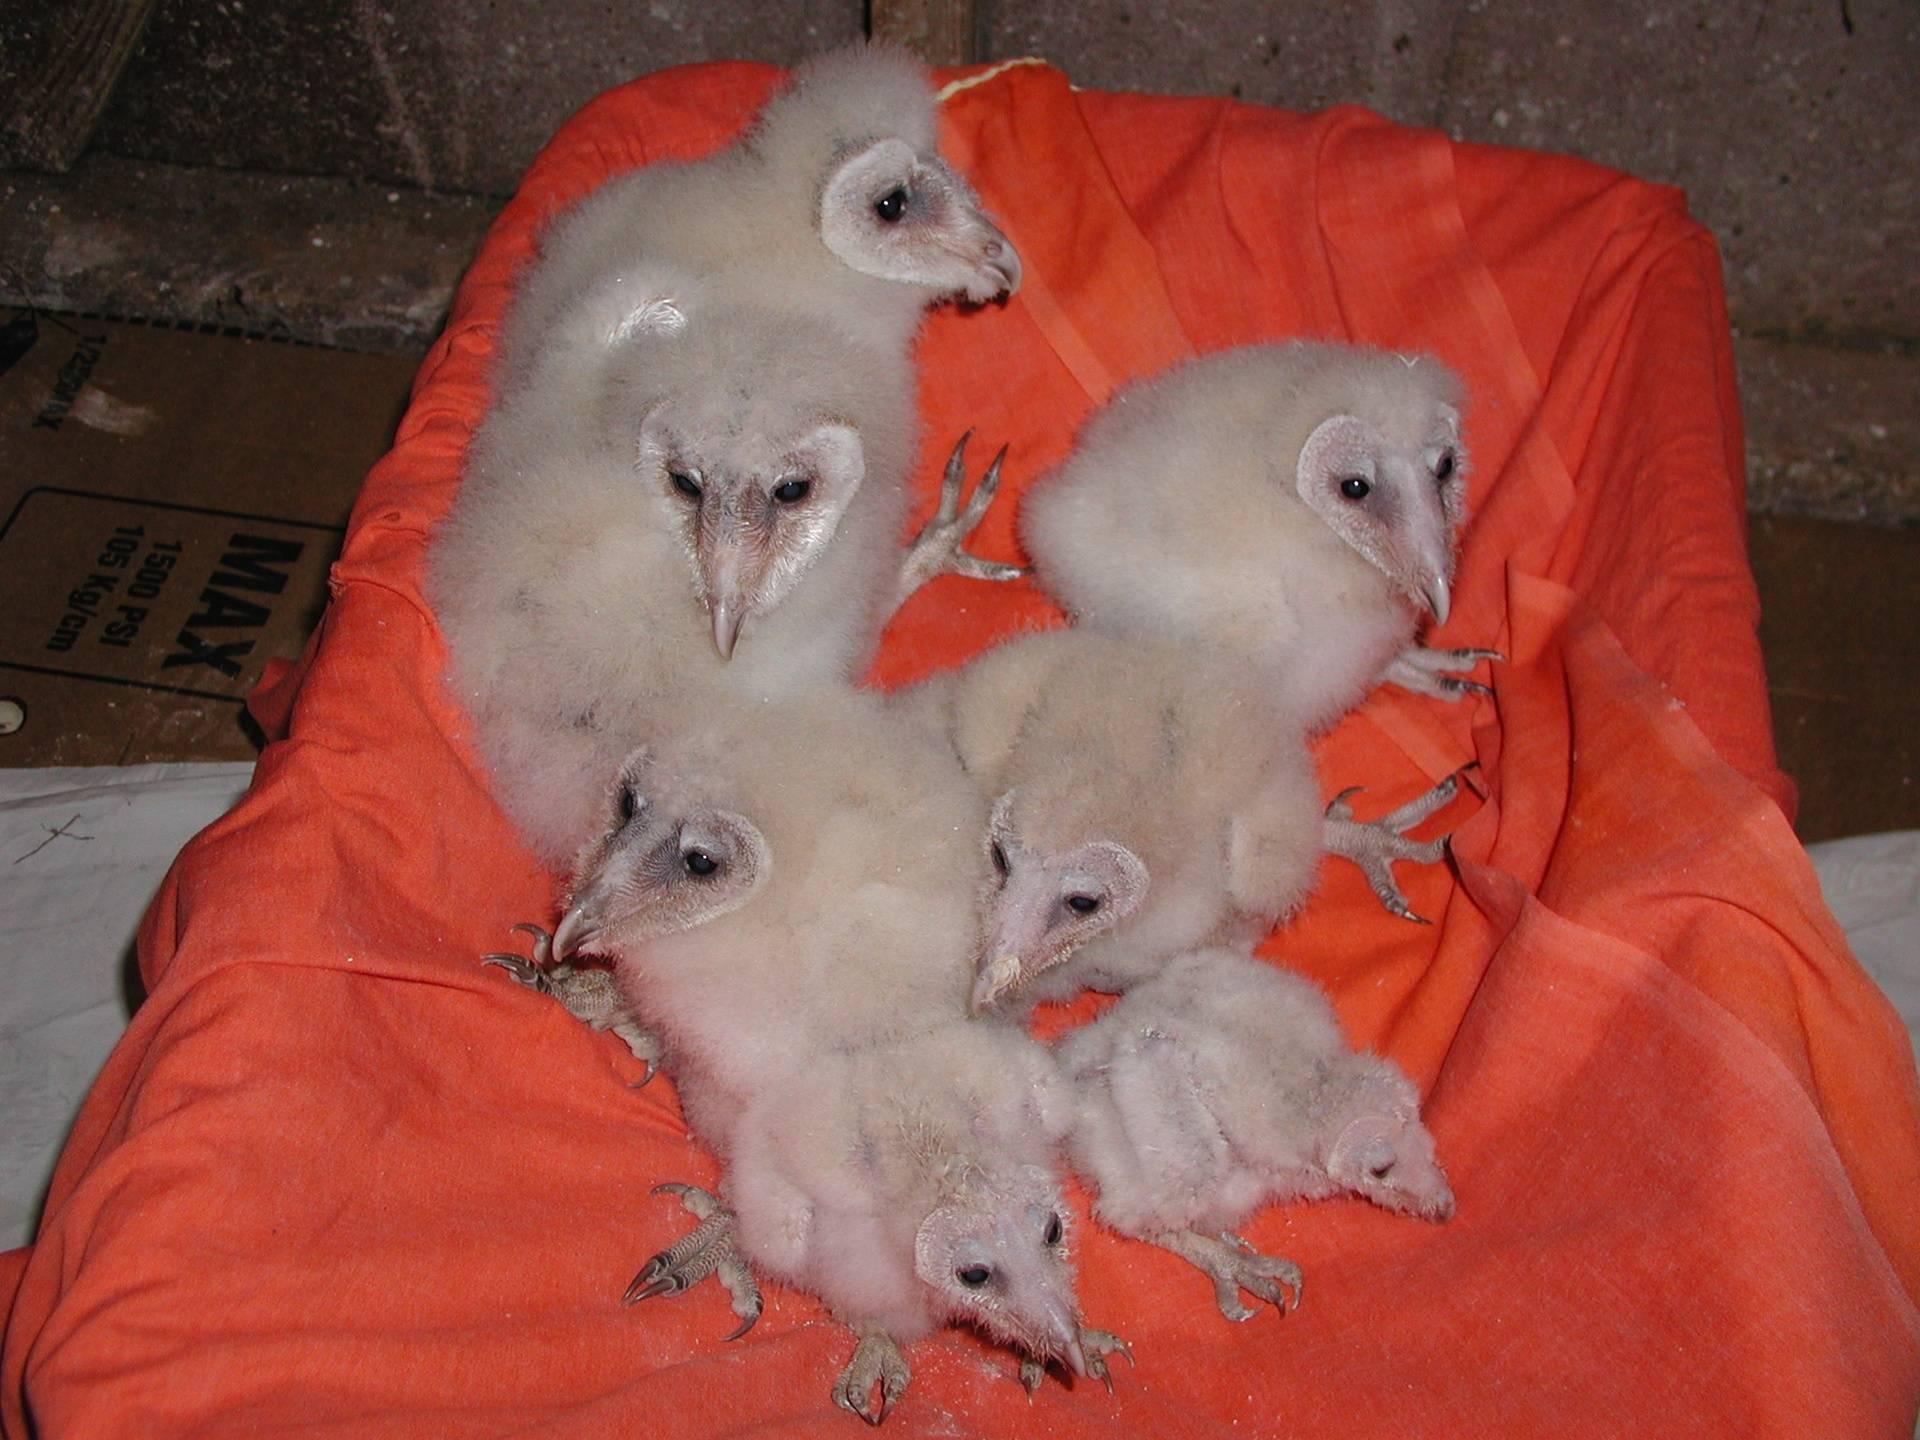 Common Barn Owl chicks